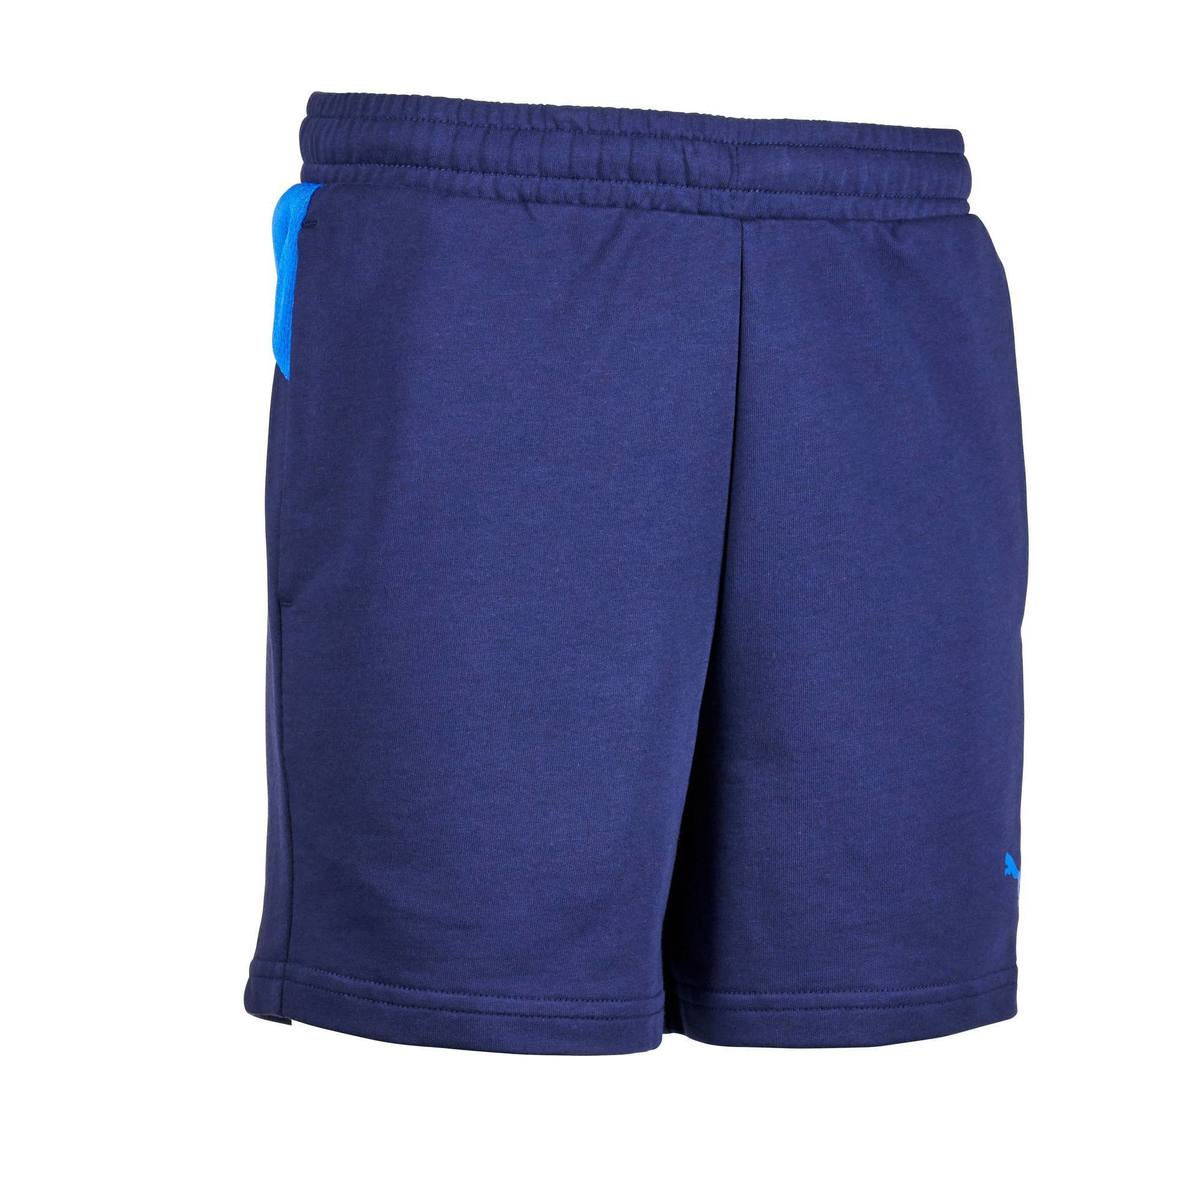 Bild 1 von Sporthose kurz Gym Kinder blau